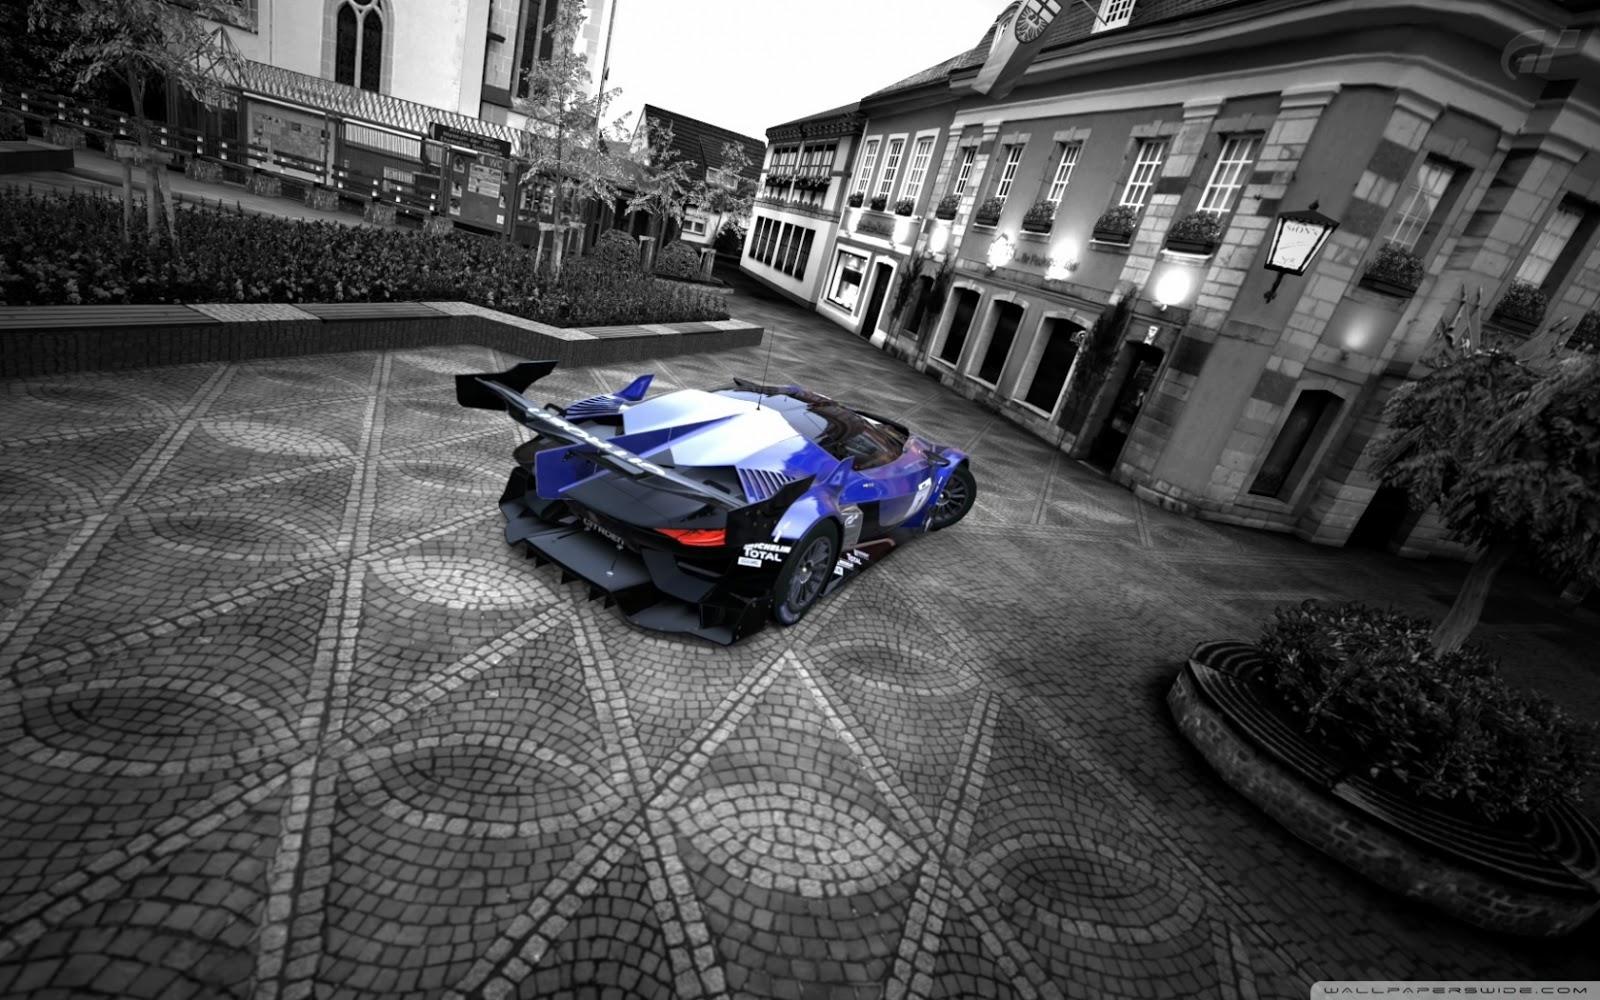 wallpaper racing car office - photo #22